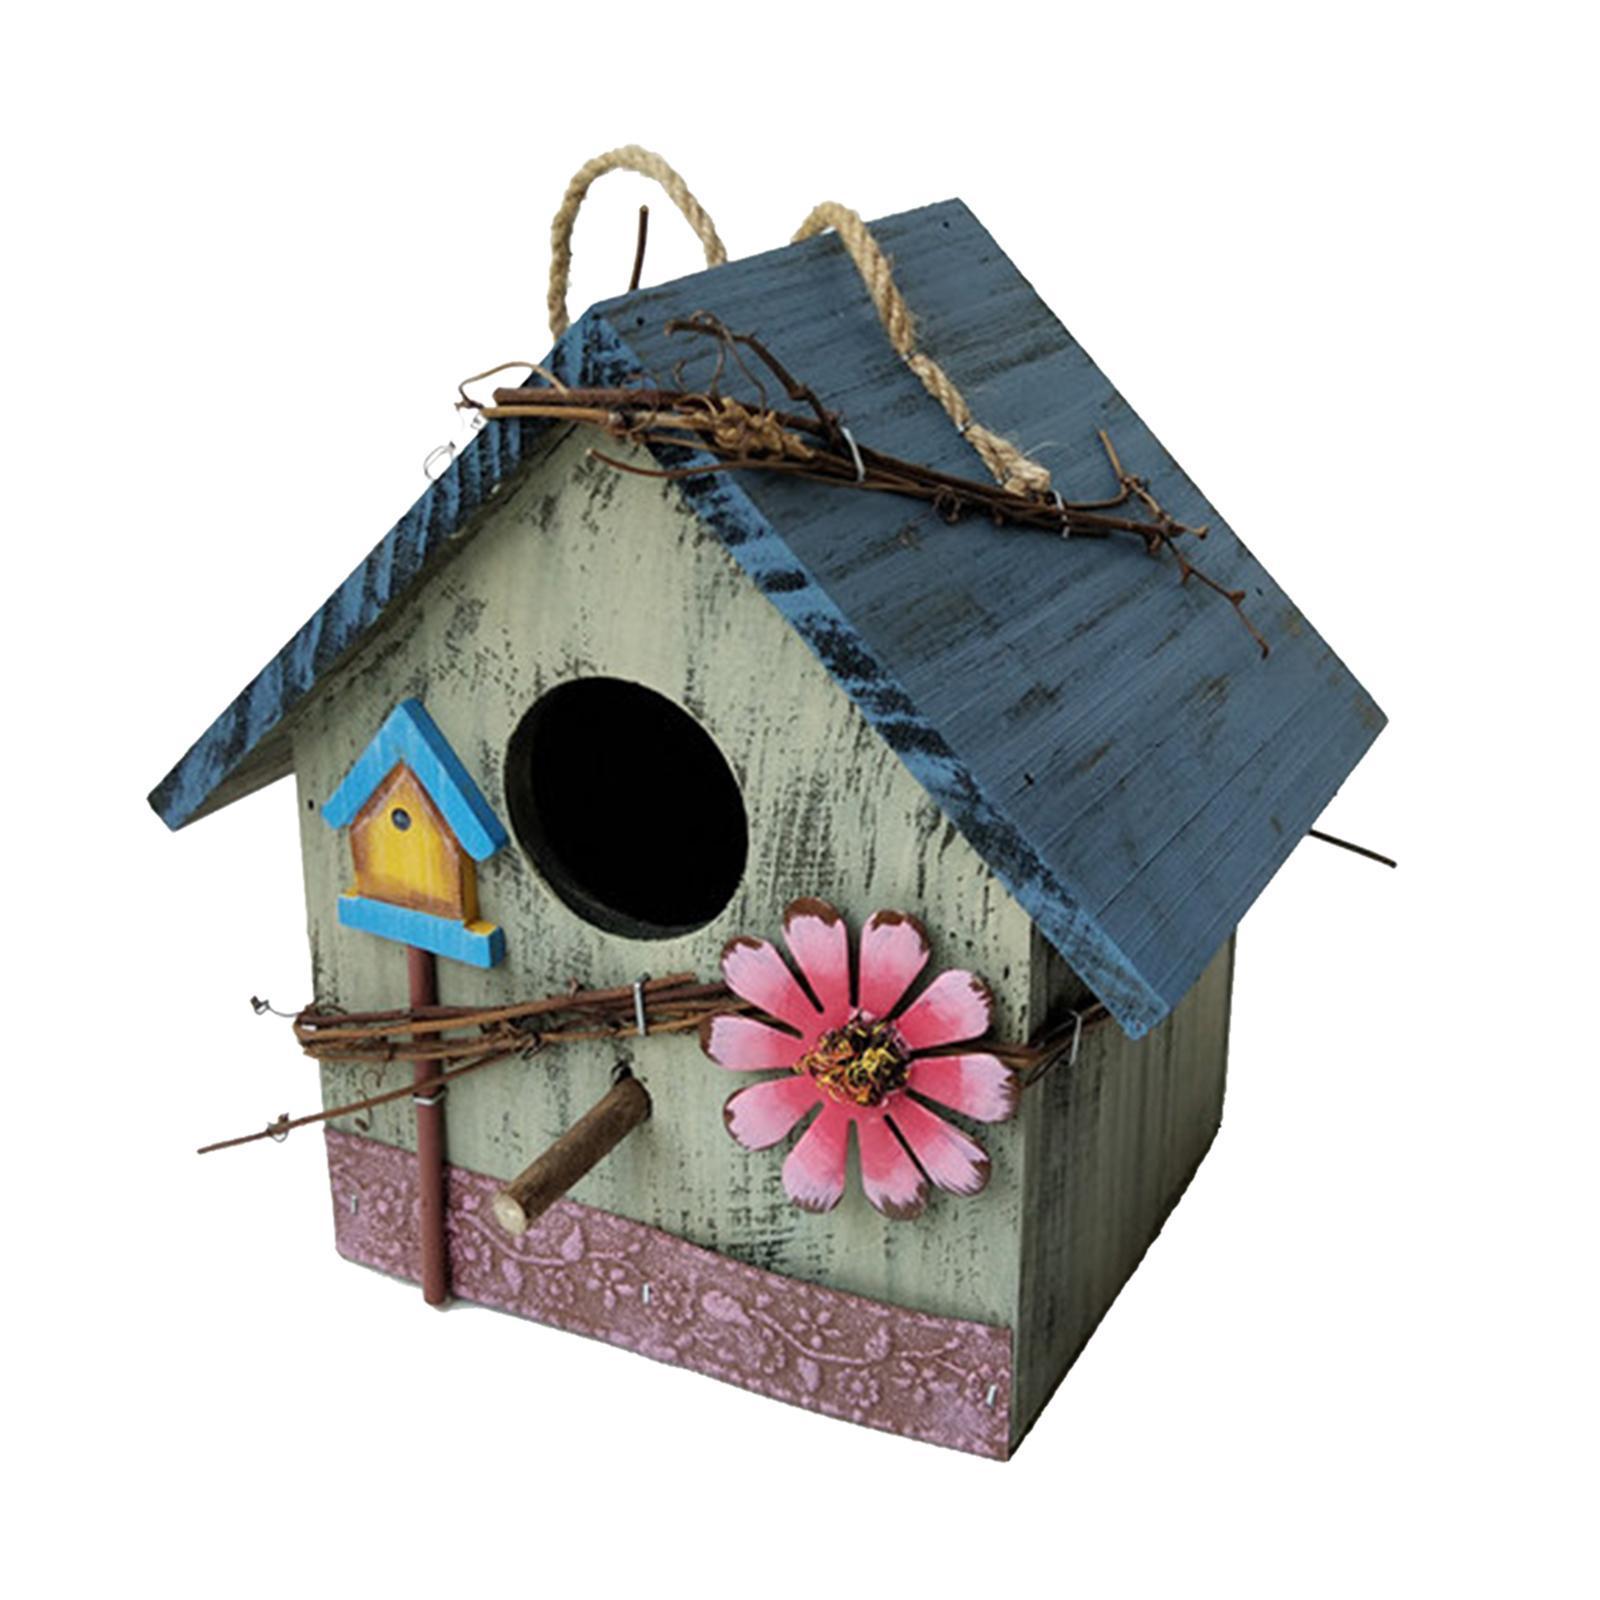 thumbnail 30 - Antique Hand Painted Wood Birdhouse Decorative Outdoor Bird House Garden